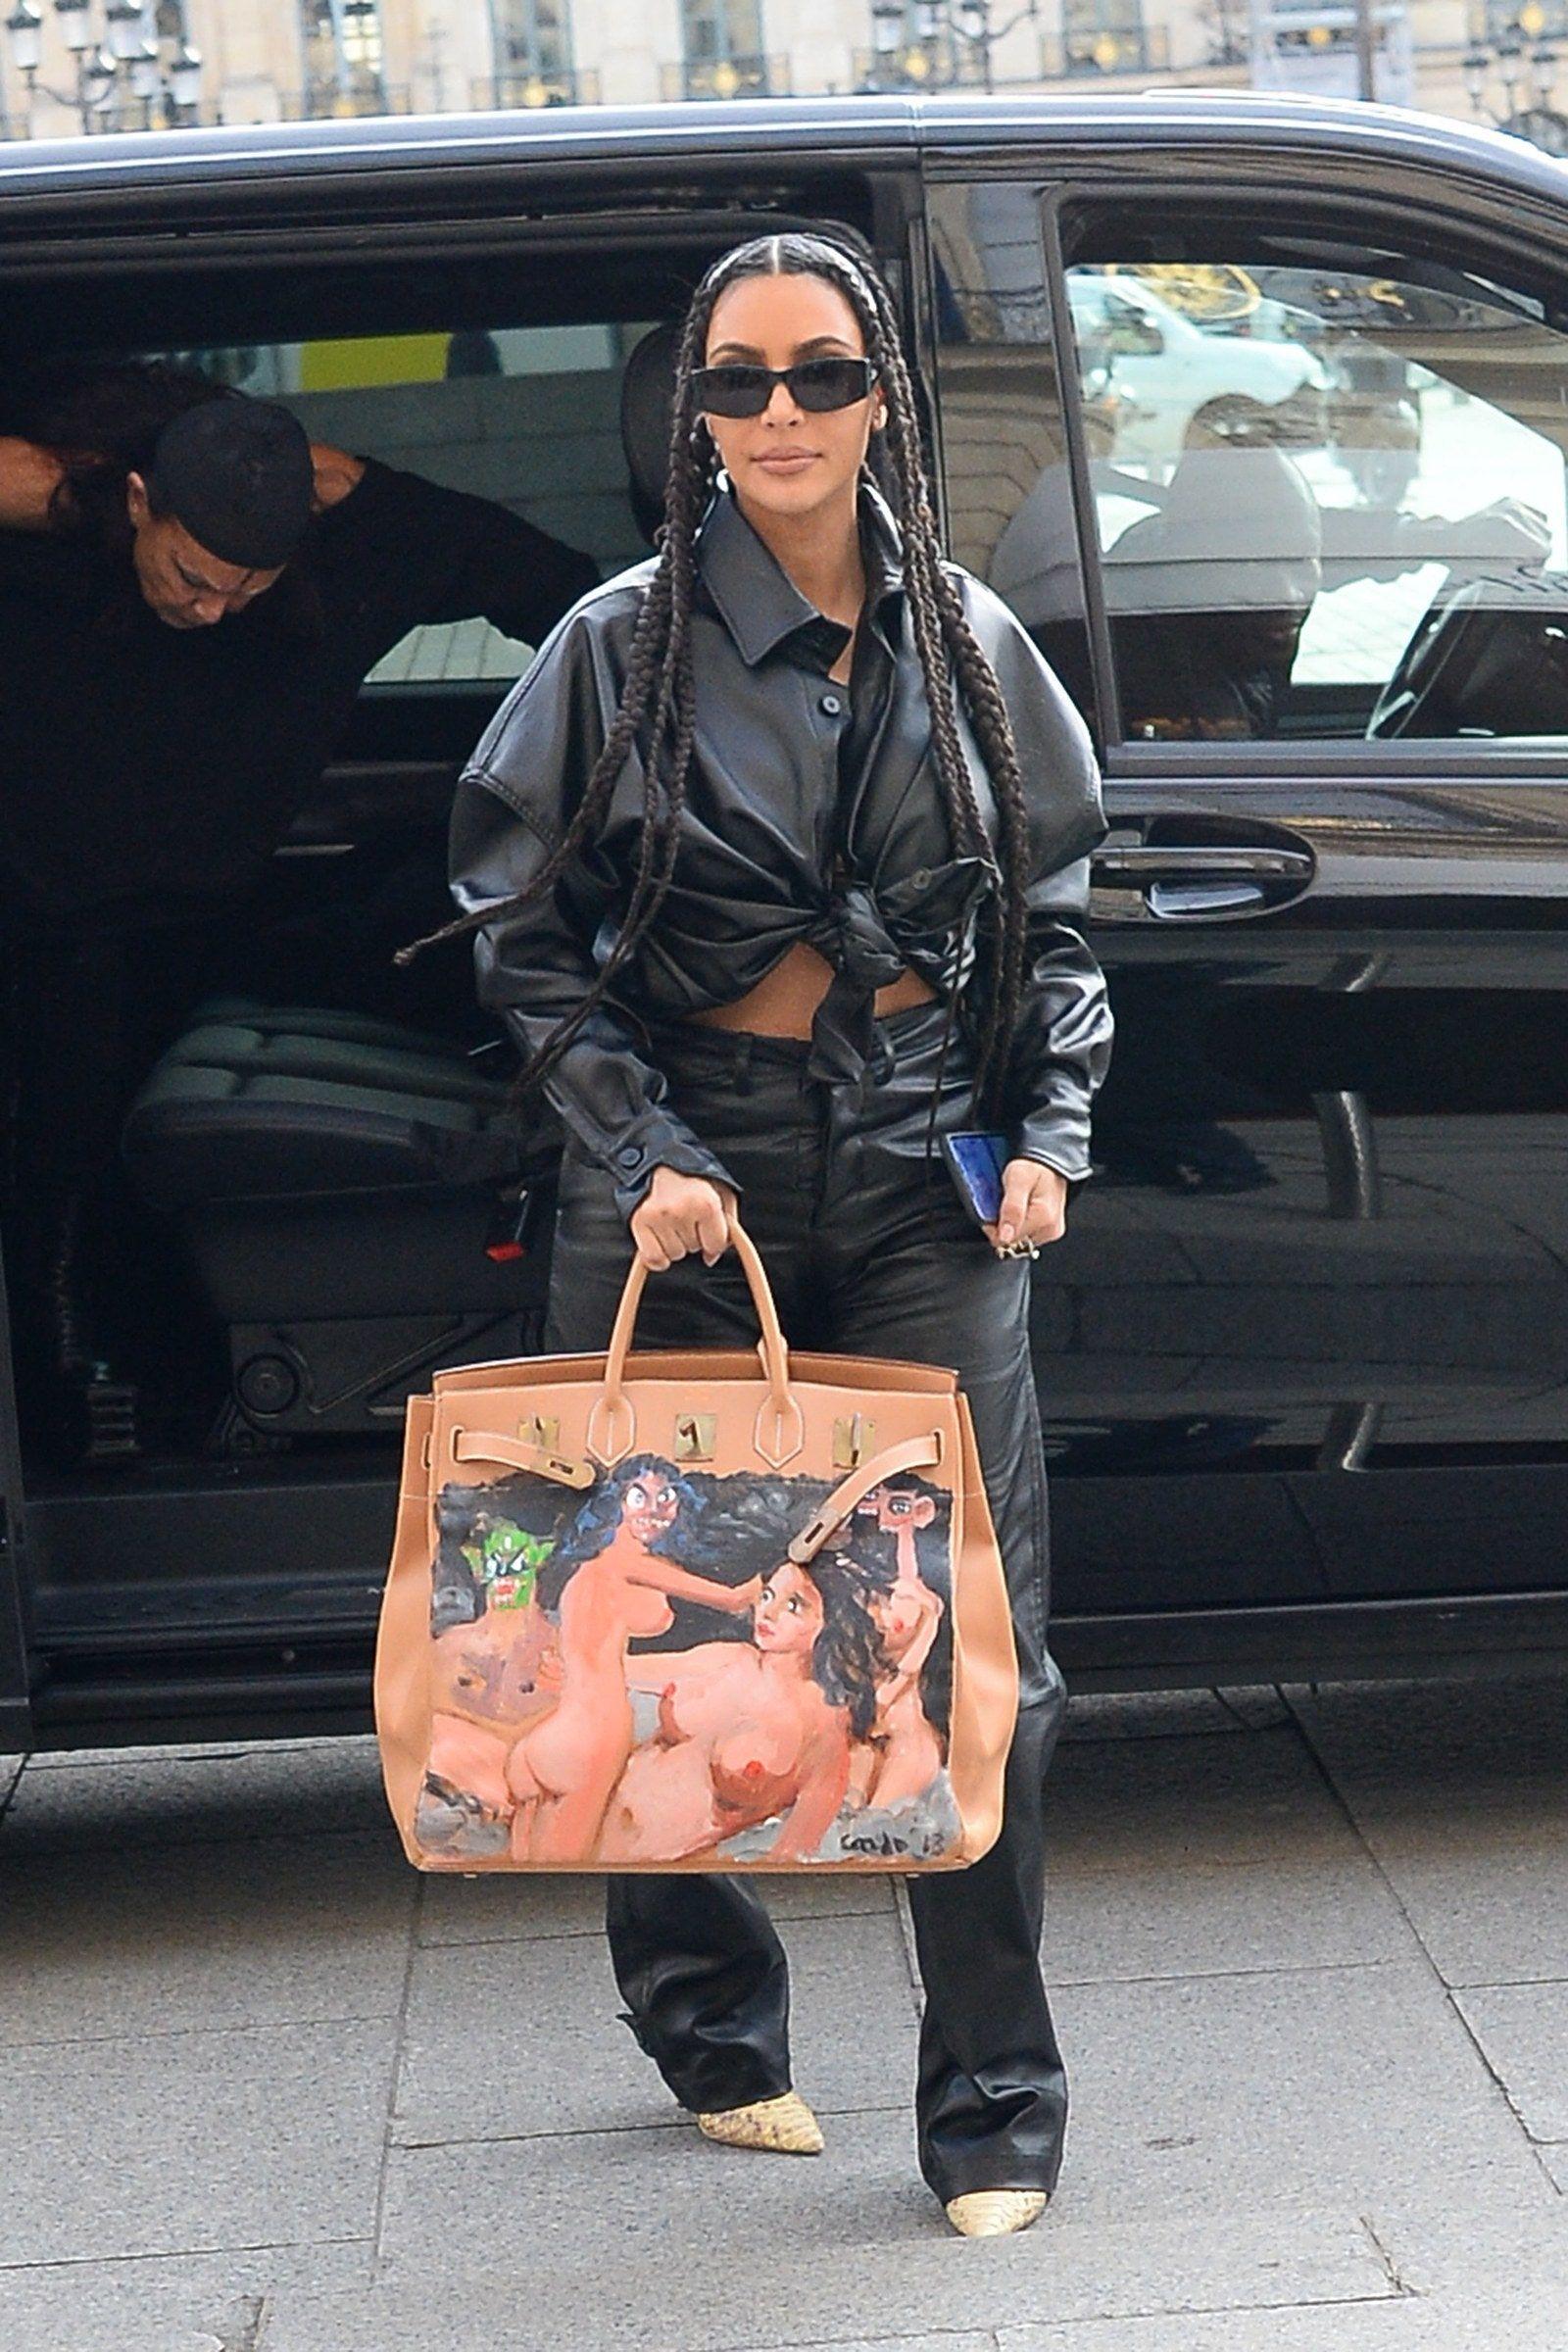 Kim Kardashian West Revives One Of Her Most Controversial Birkins In 2020 Kim Kardashian Black Birkin Bag Hermes Bag Birkin